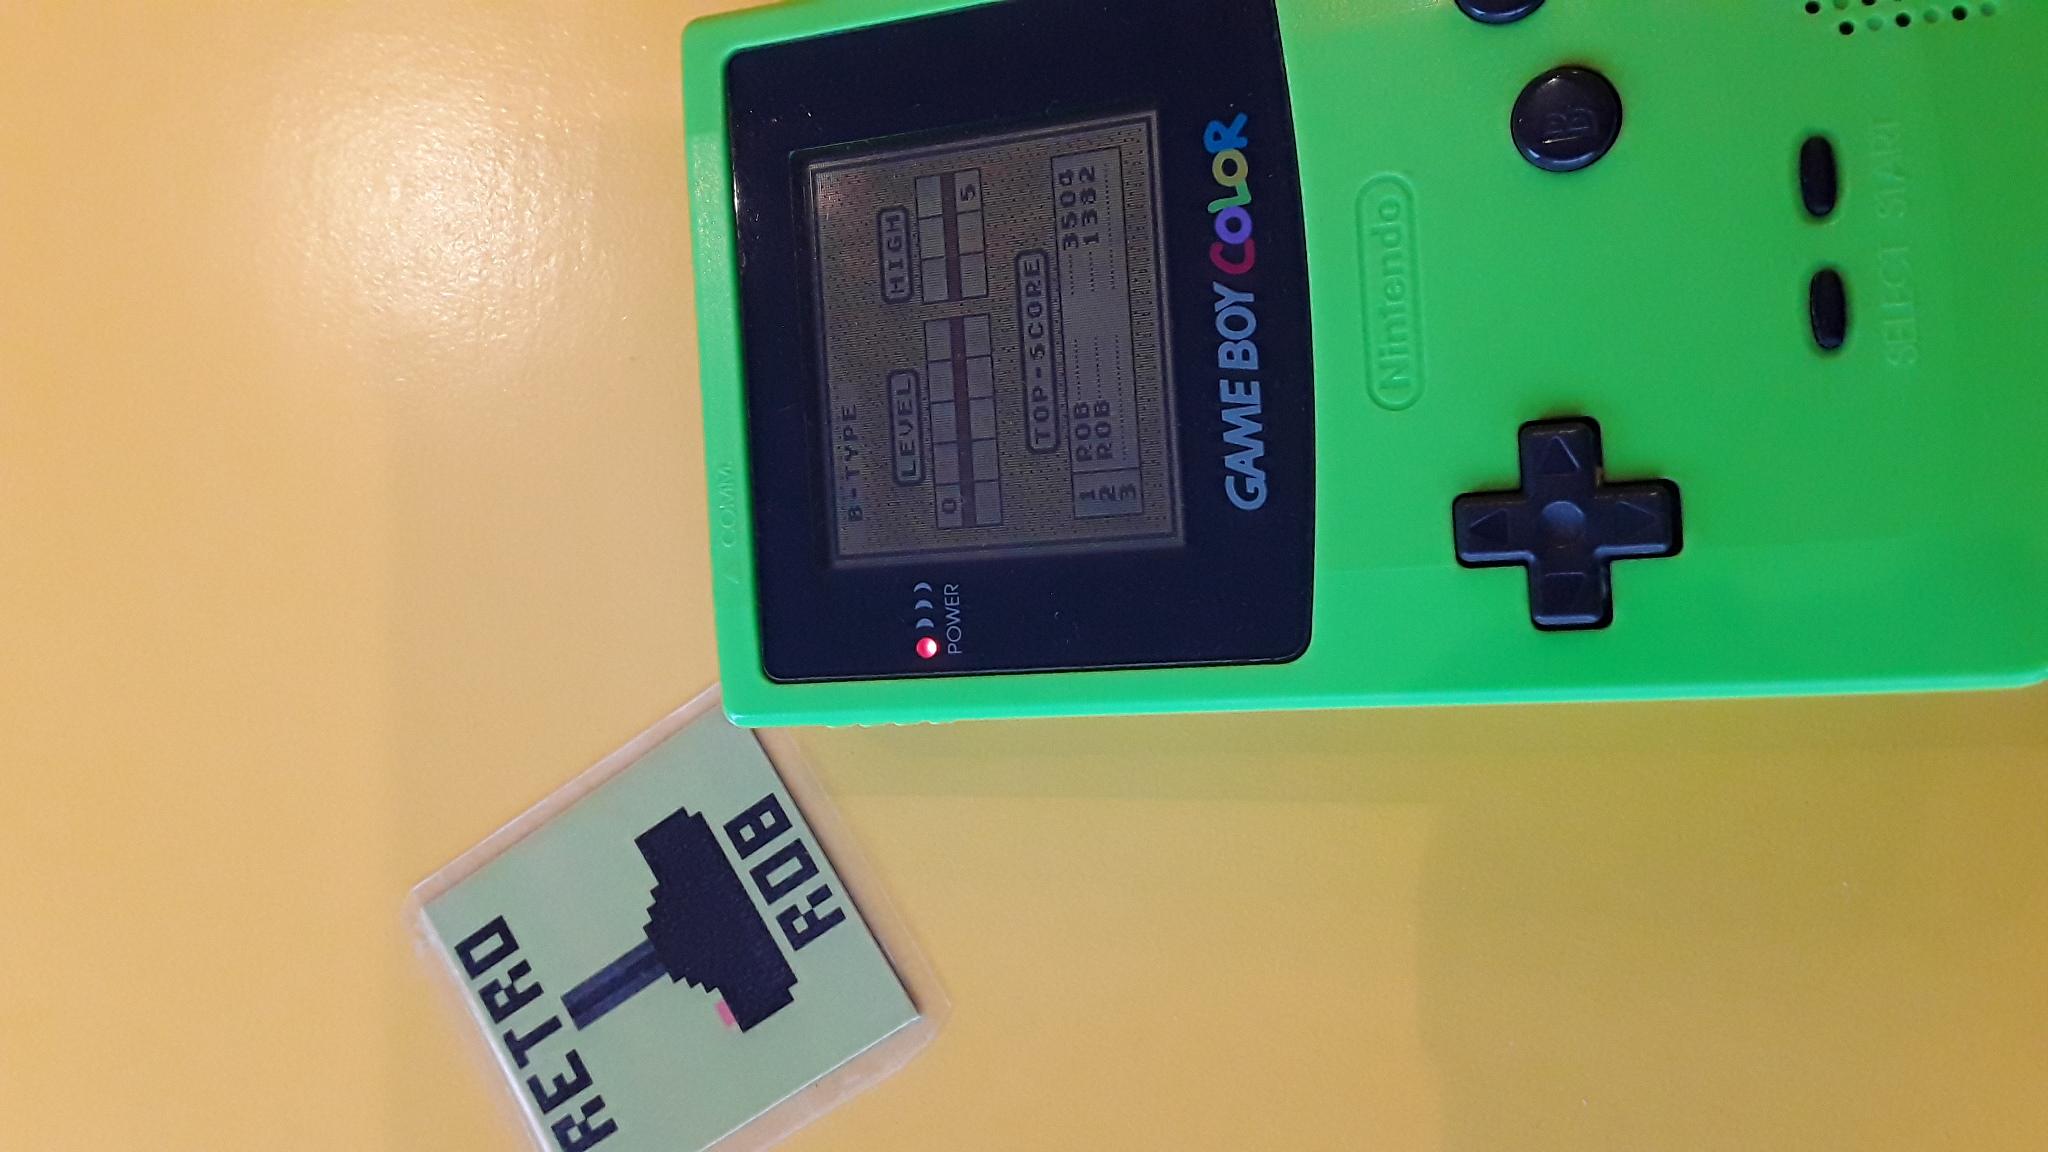 RetroRob: Tetris: Type B [Level 0 / High 5] (Game Boy) 3,504 points on 2020-10-03 11:18:37